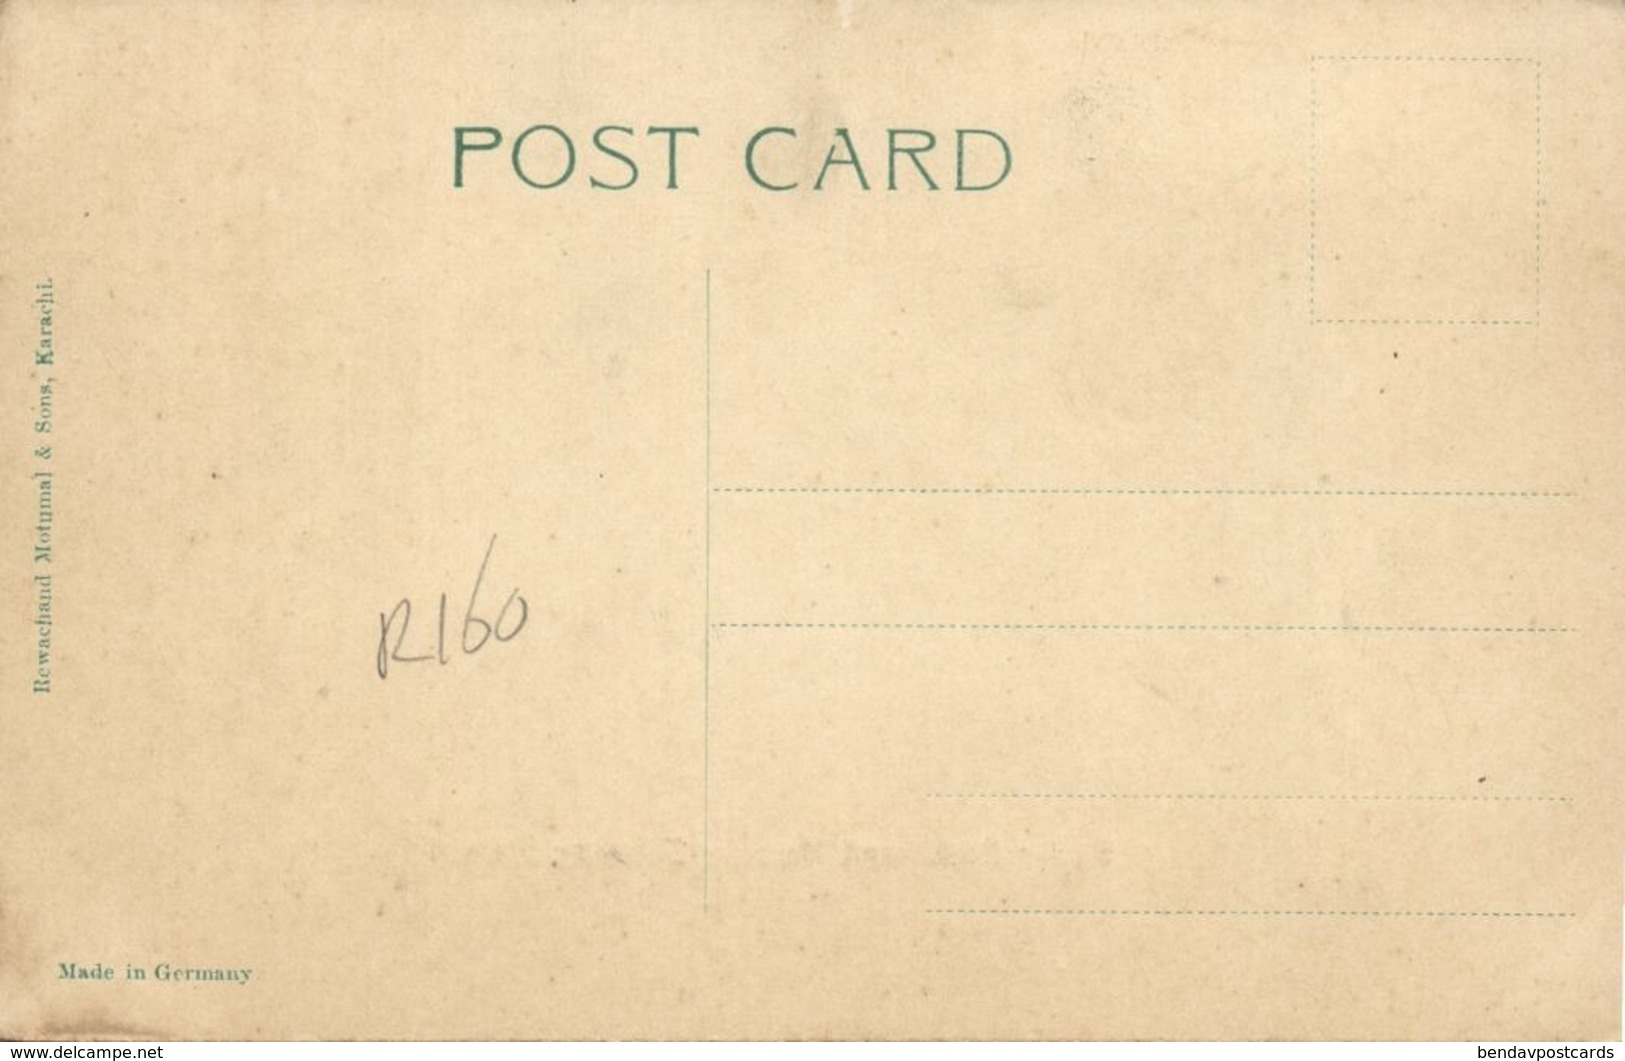 Pakistan, KARACHI, Oyster Rocks, Harbour Entrance (1910s) R. Motumal Postcard - Pakistan